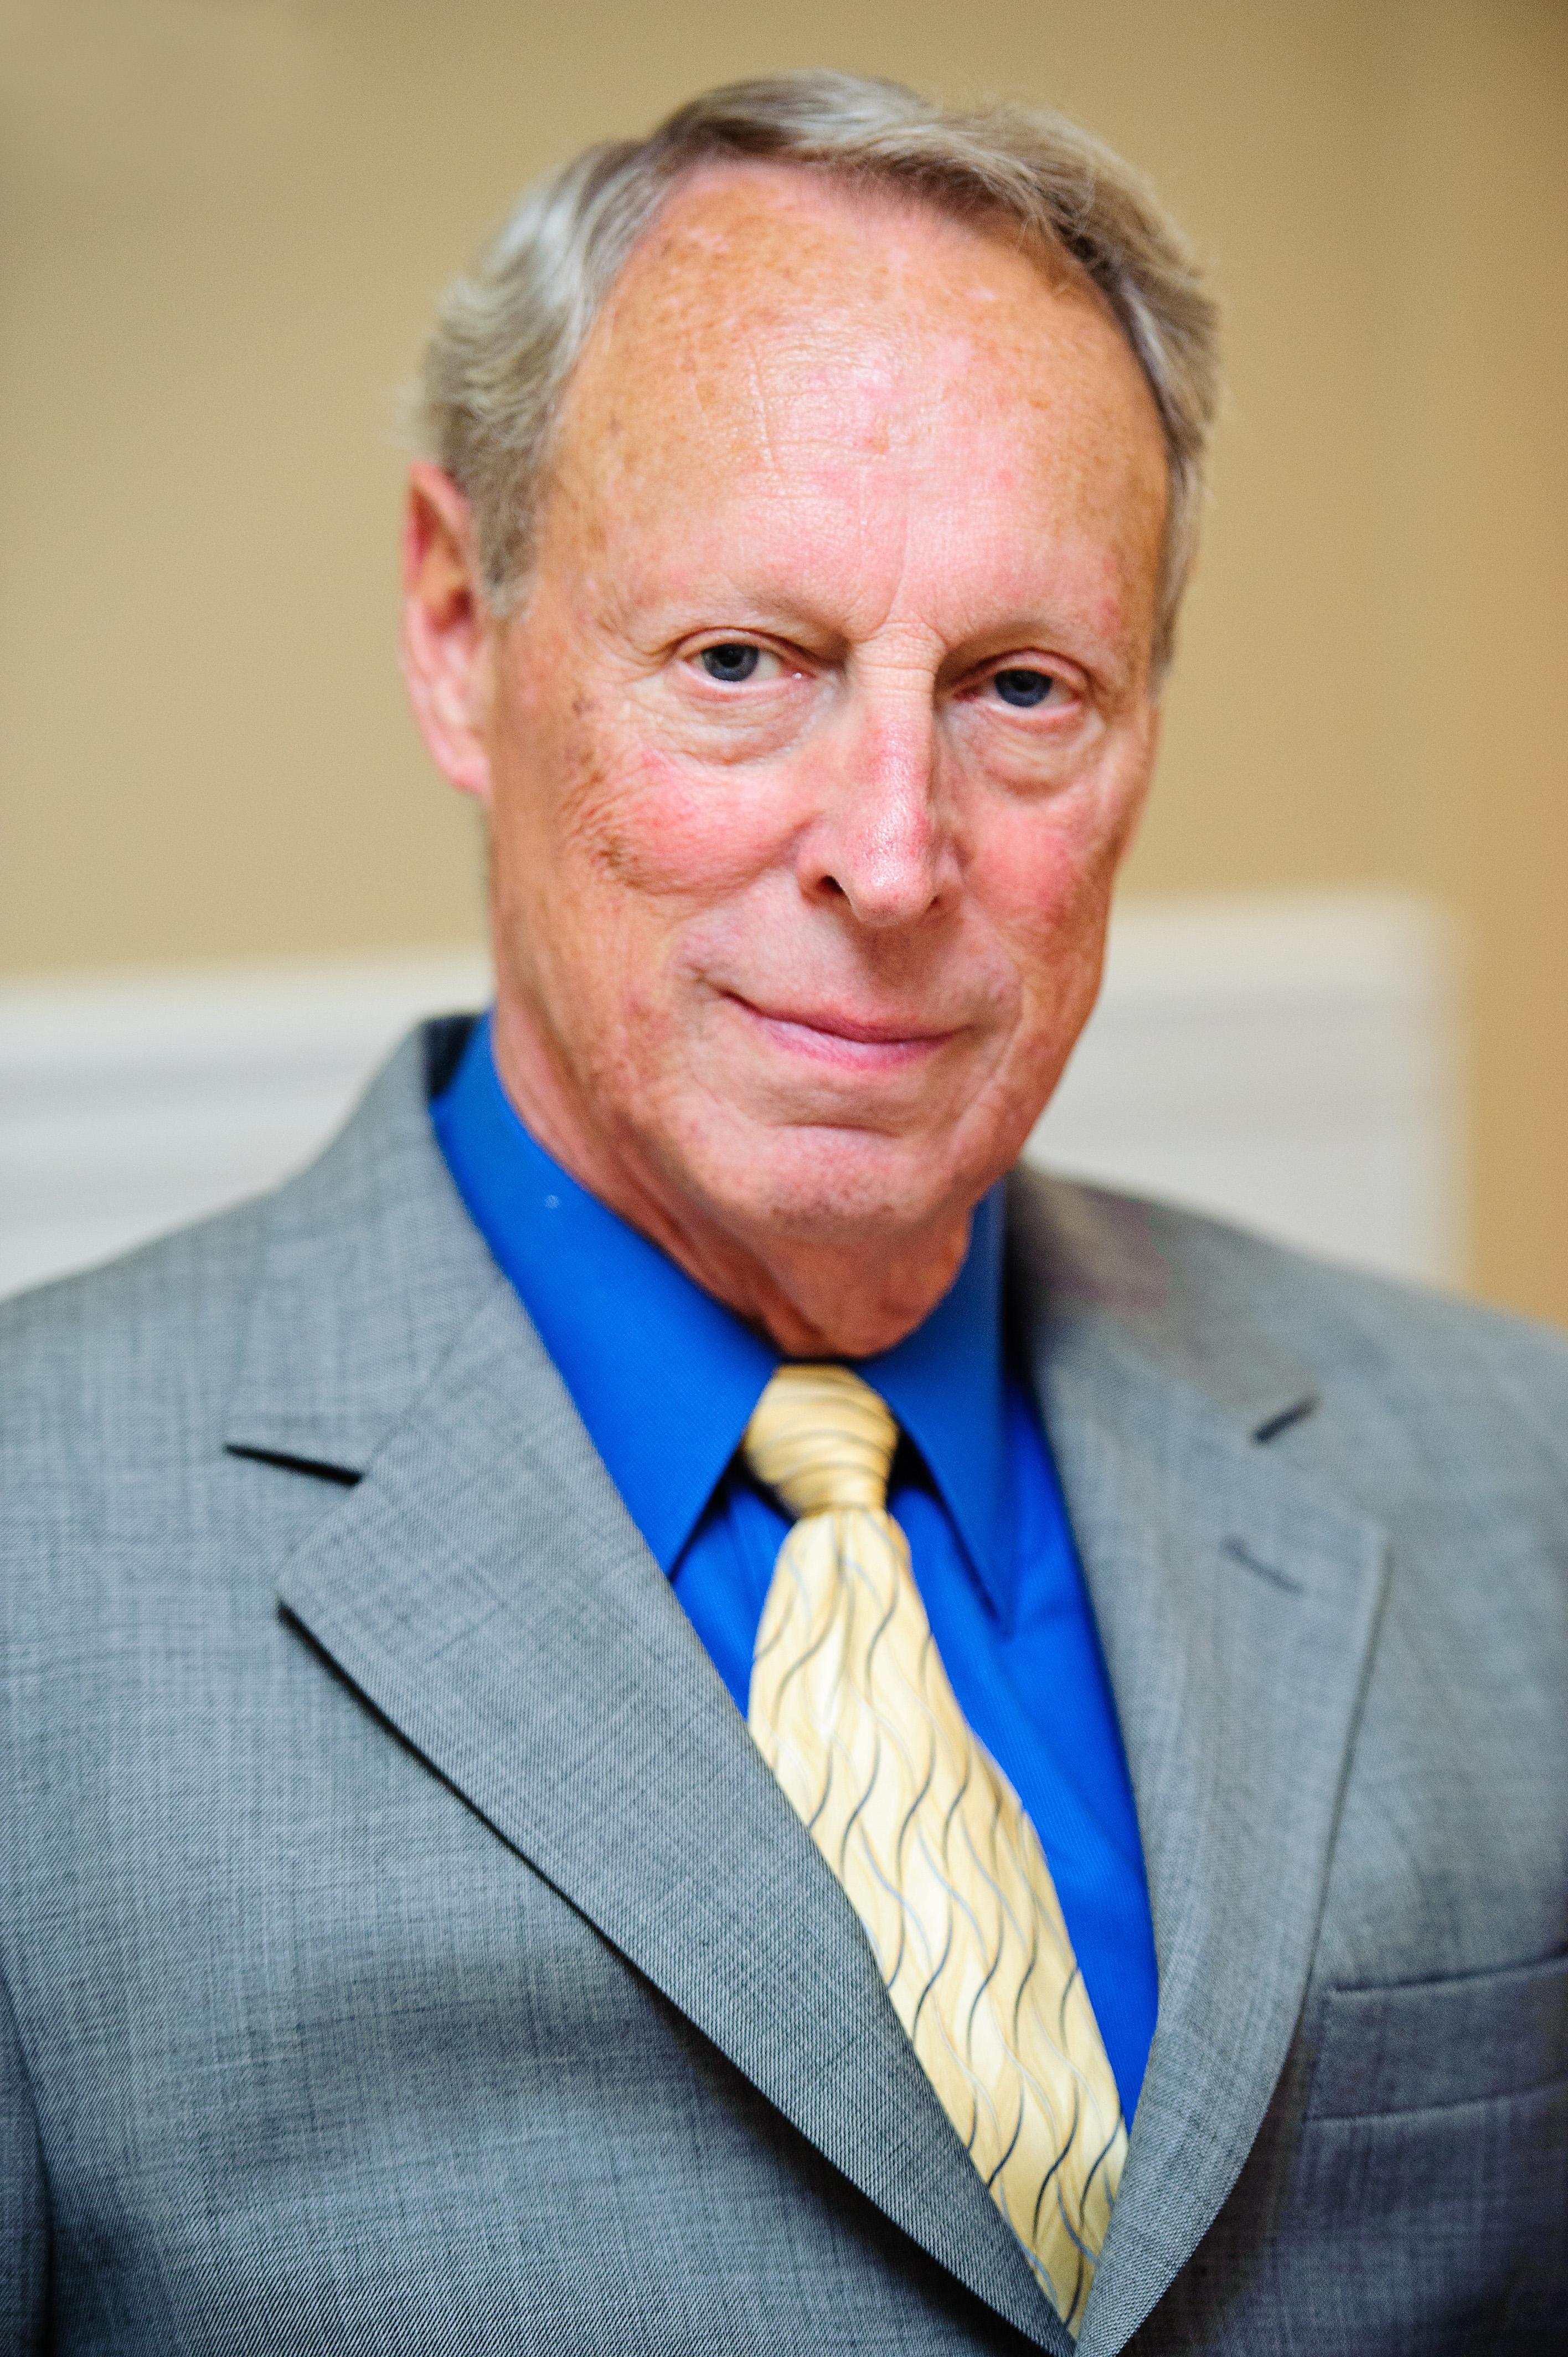 Larry-Callahan-Headshot-President-Articl